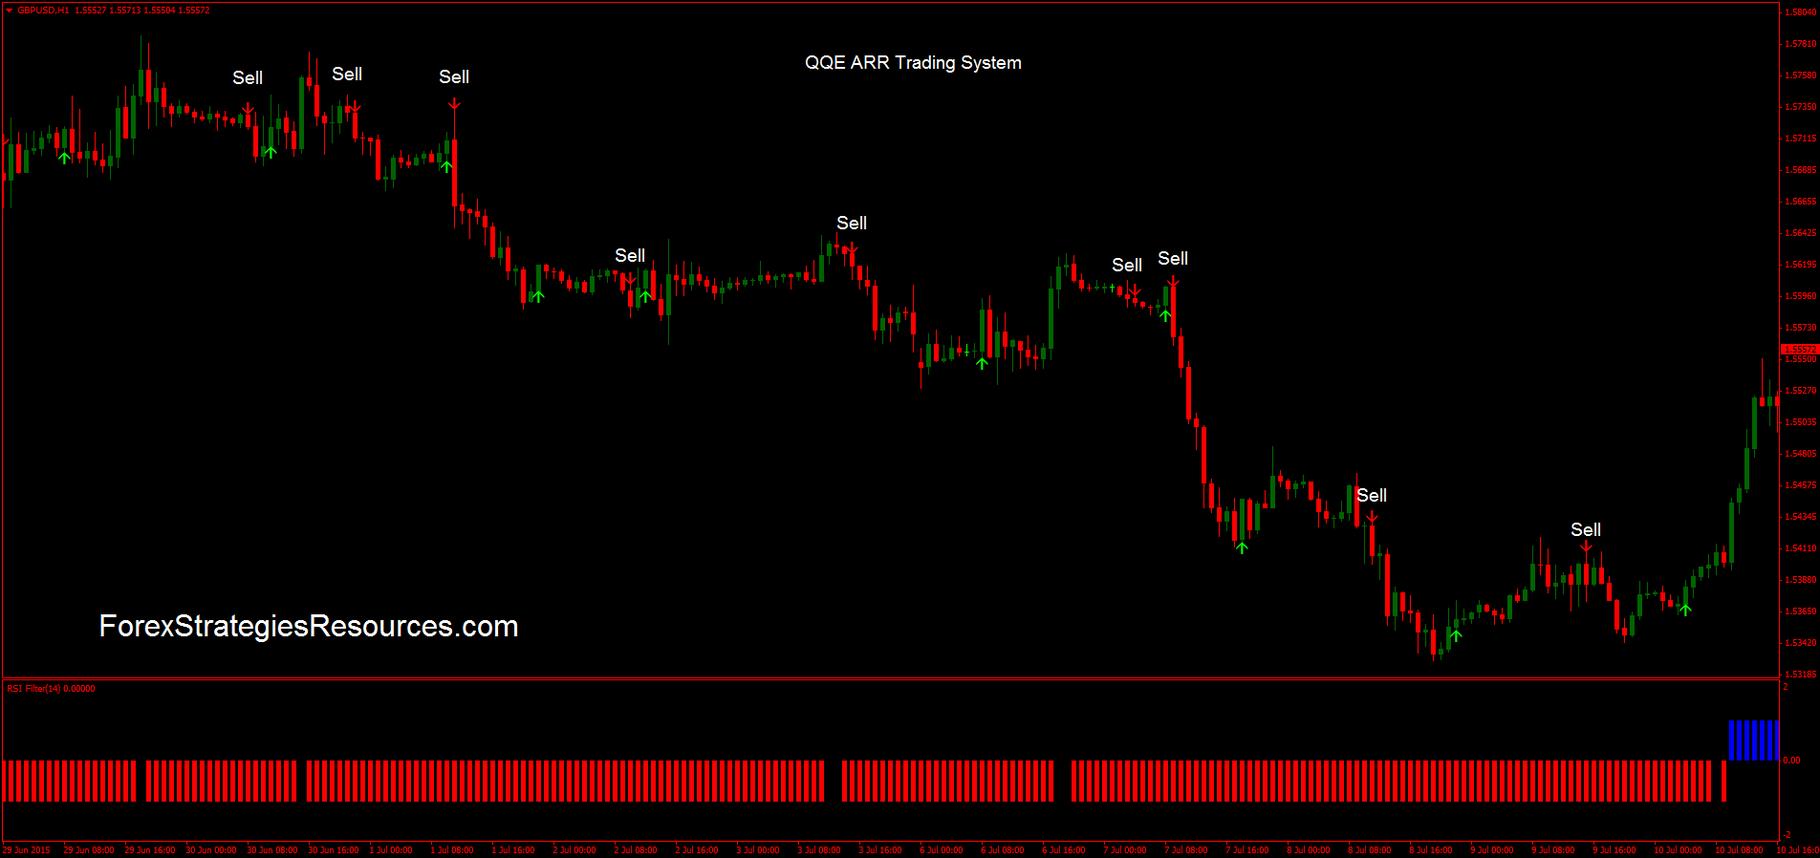 Qqe trading system